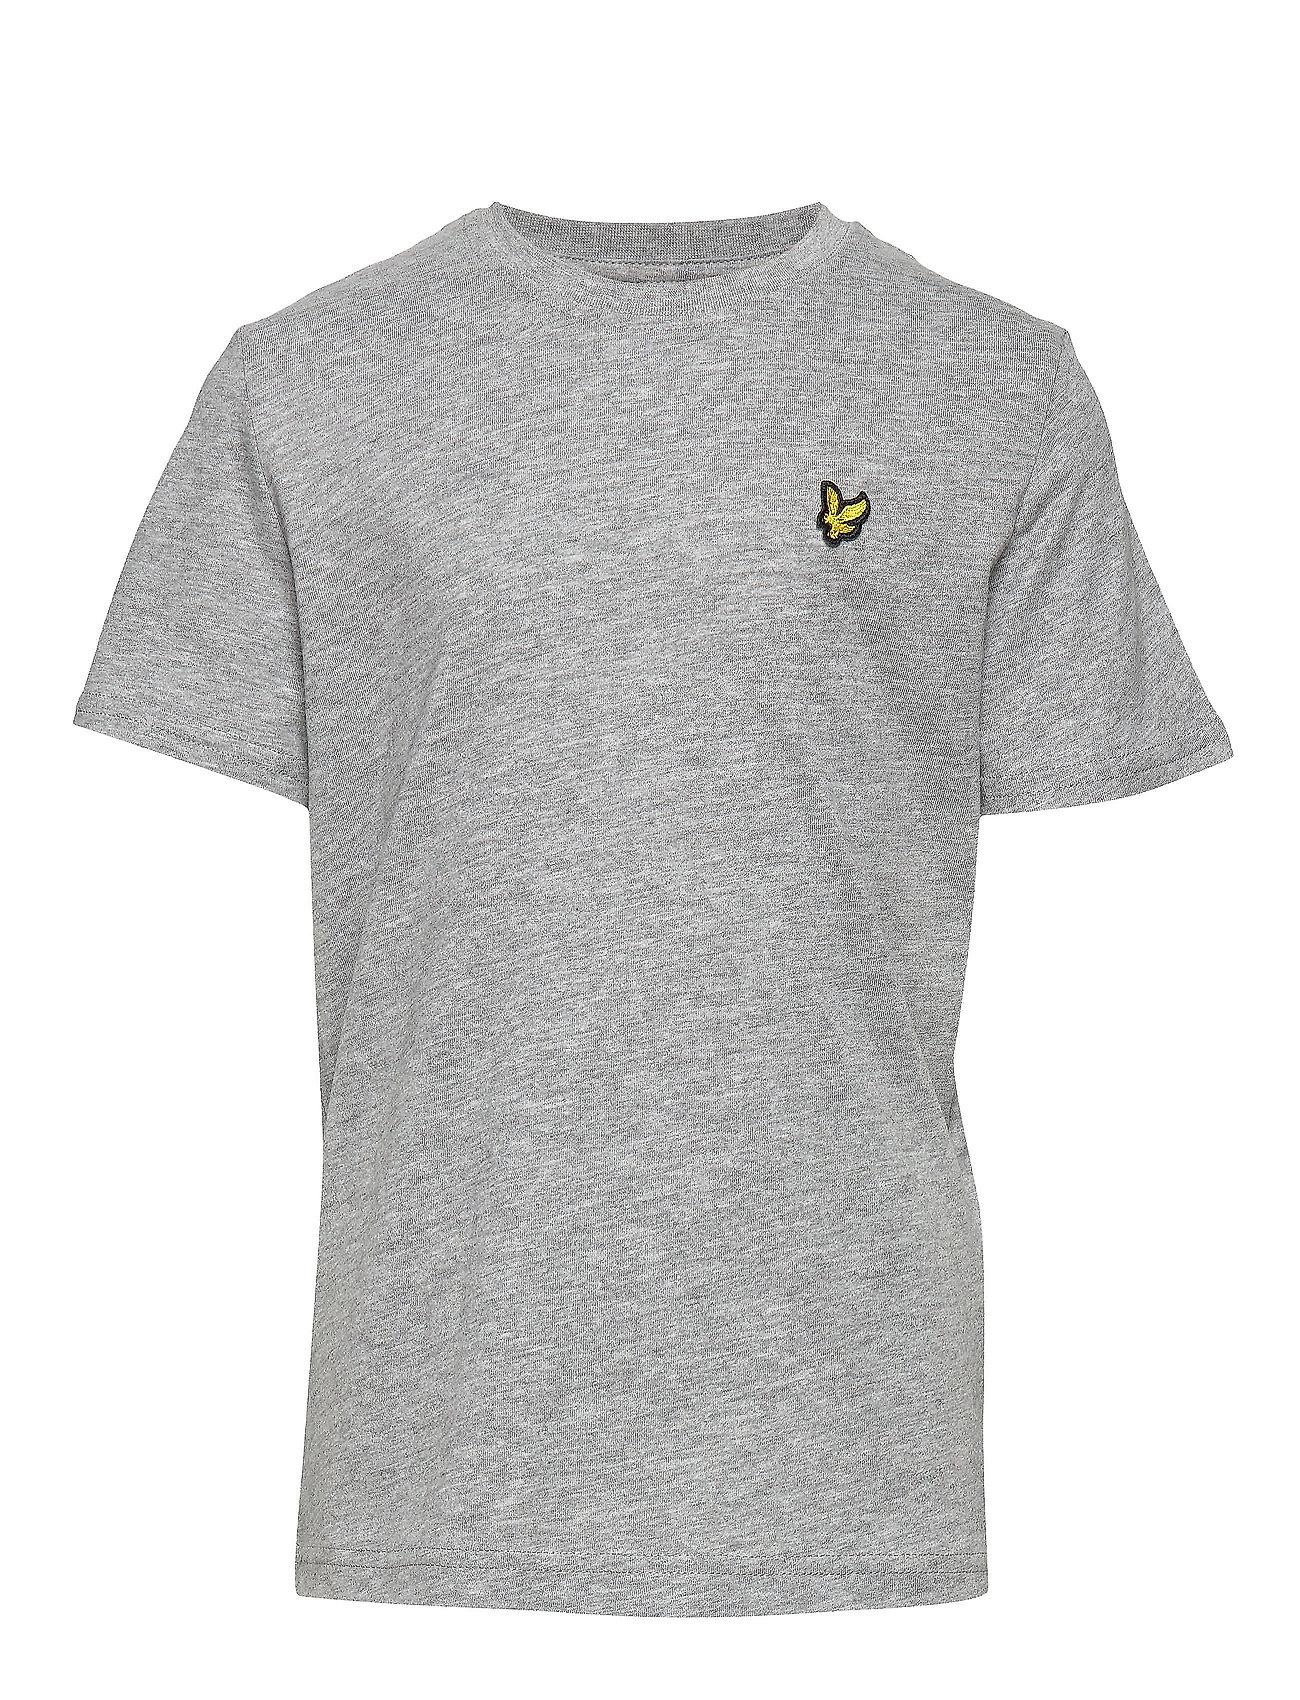 Lyle & Scott Junior Classic T-Shirt - VINTAGE GREY HEATHER